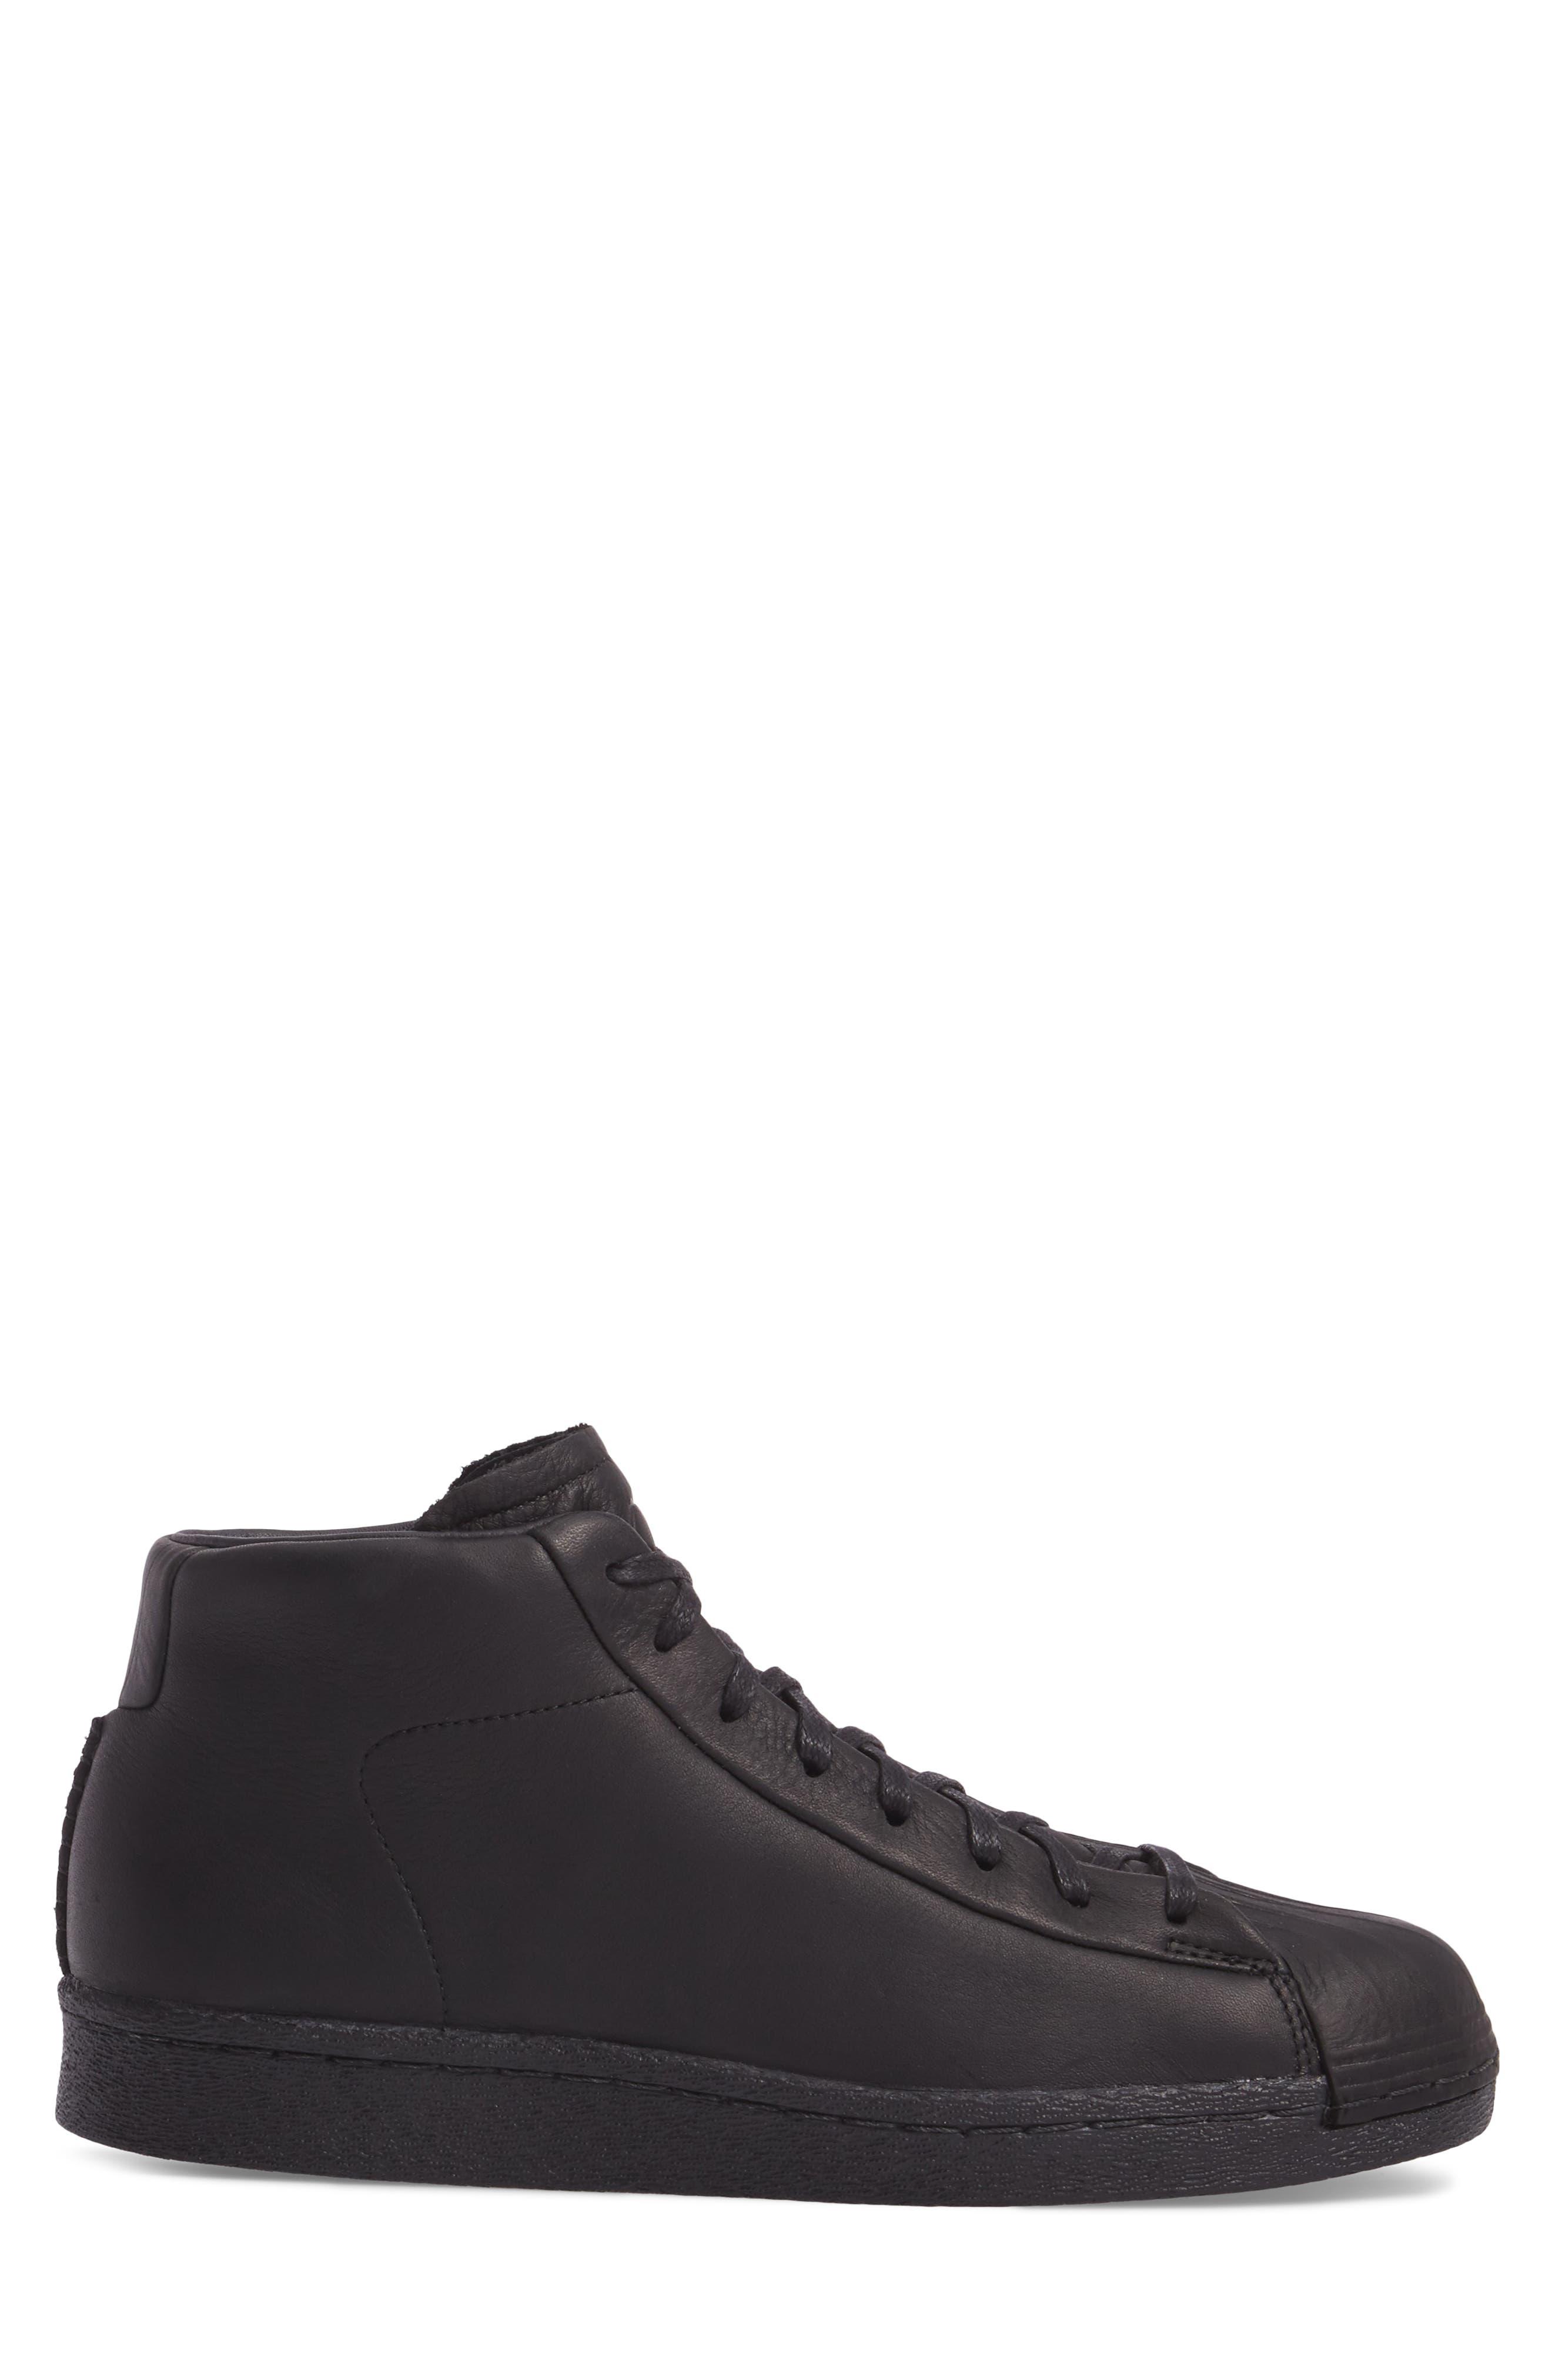 High-Top Sneaker,                             Alternate thumbnail 3, color,                             001